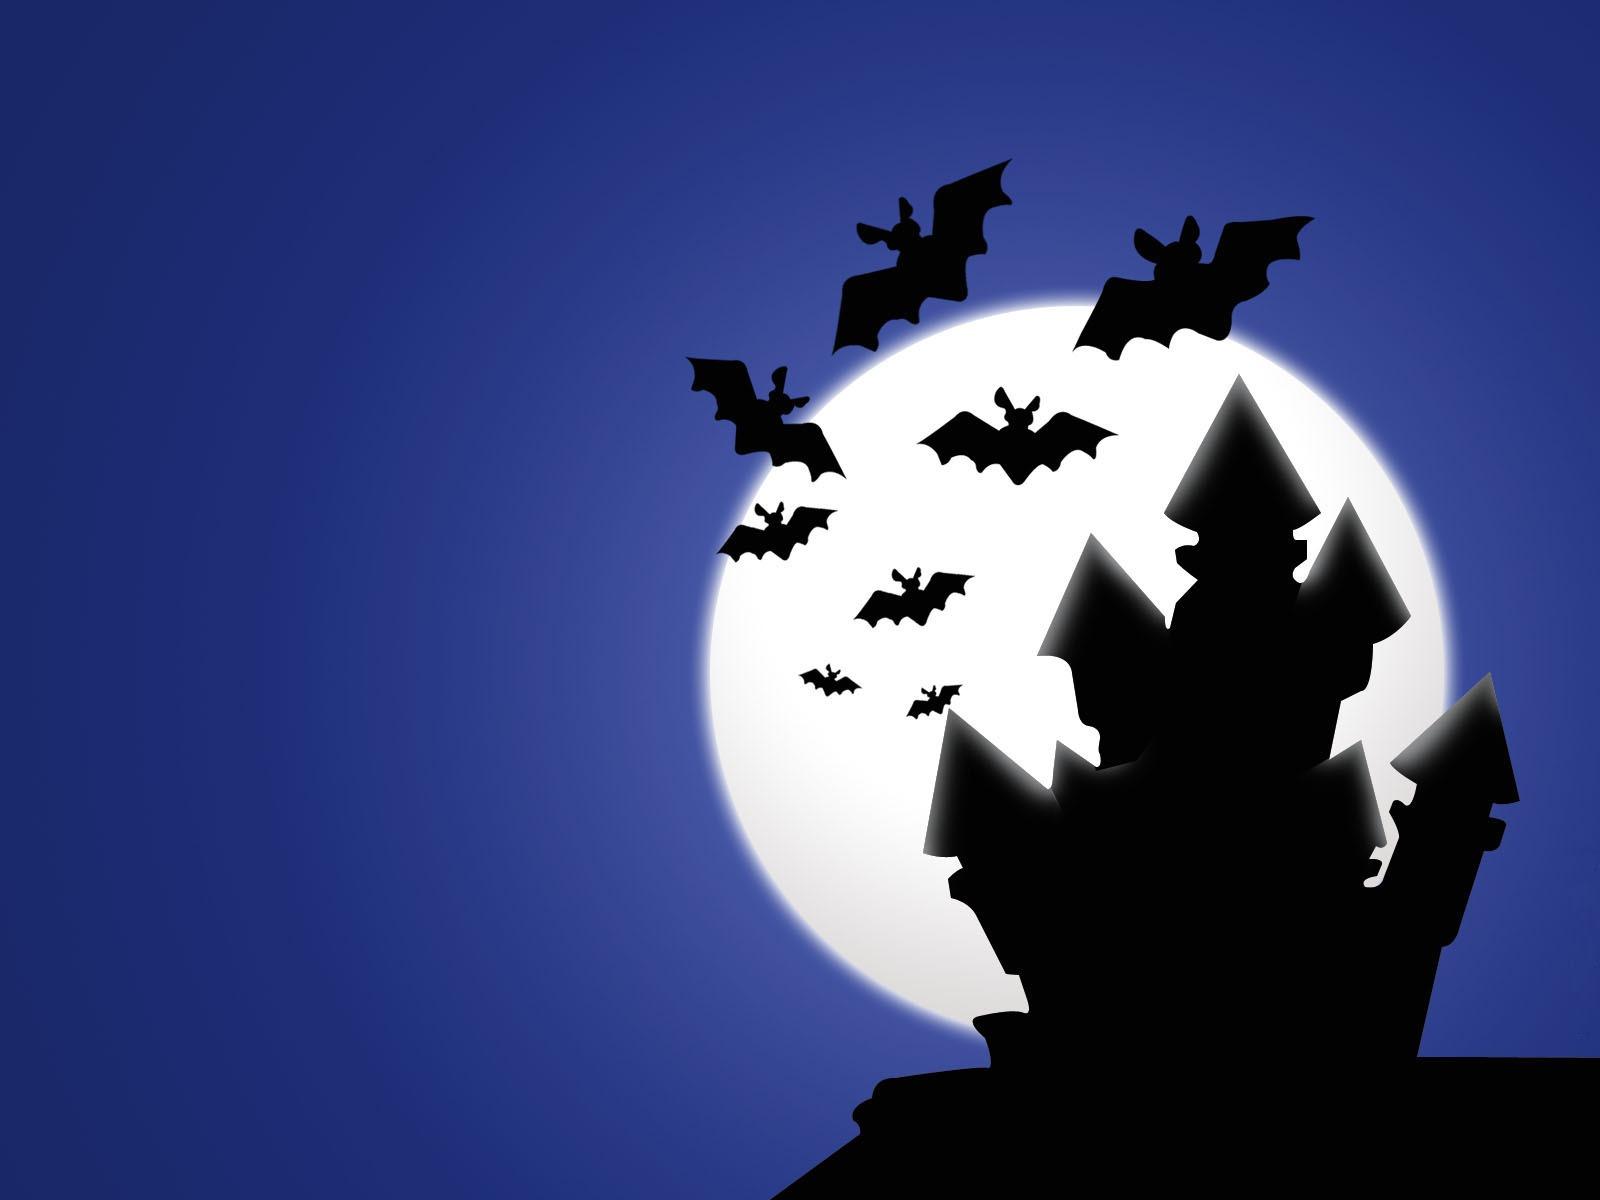 Amazing Wallpaper Halloween Ghost - halloween_vampires_wallpaper_halloween_holidays_3242  Photograph_355594.jpg